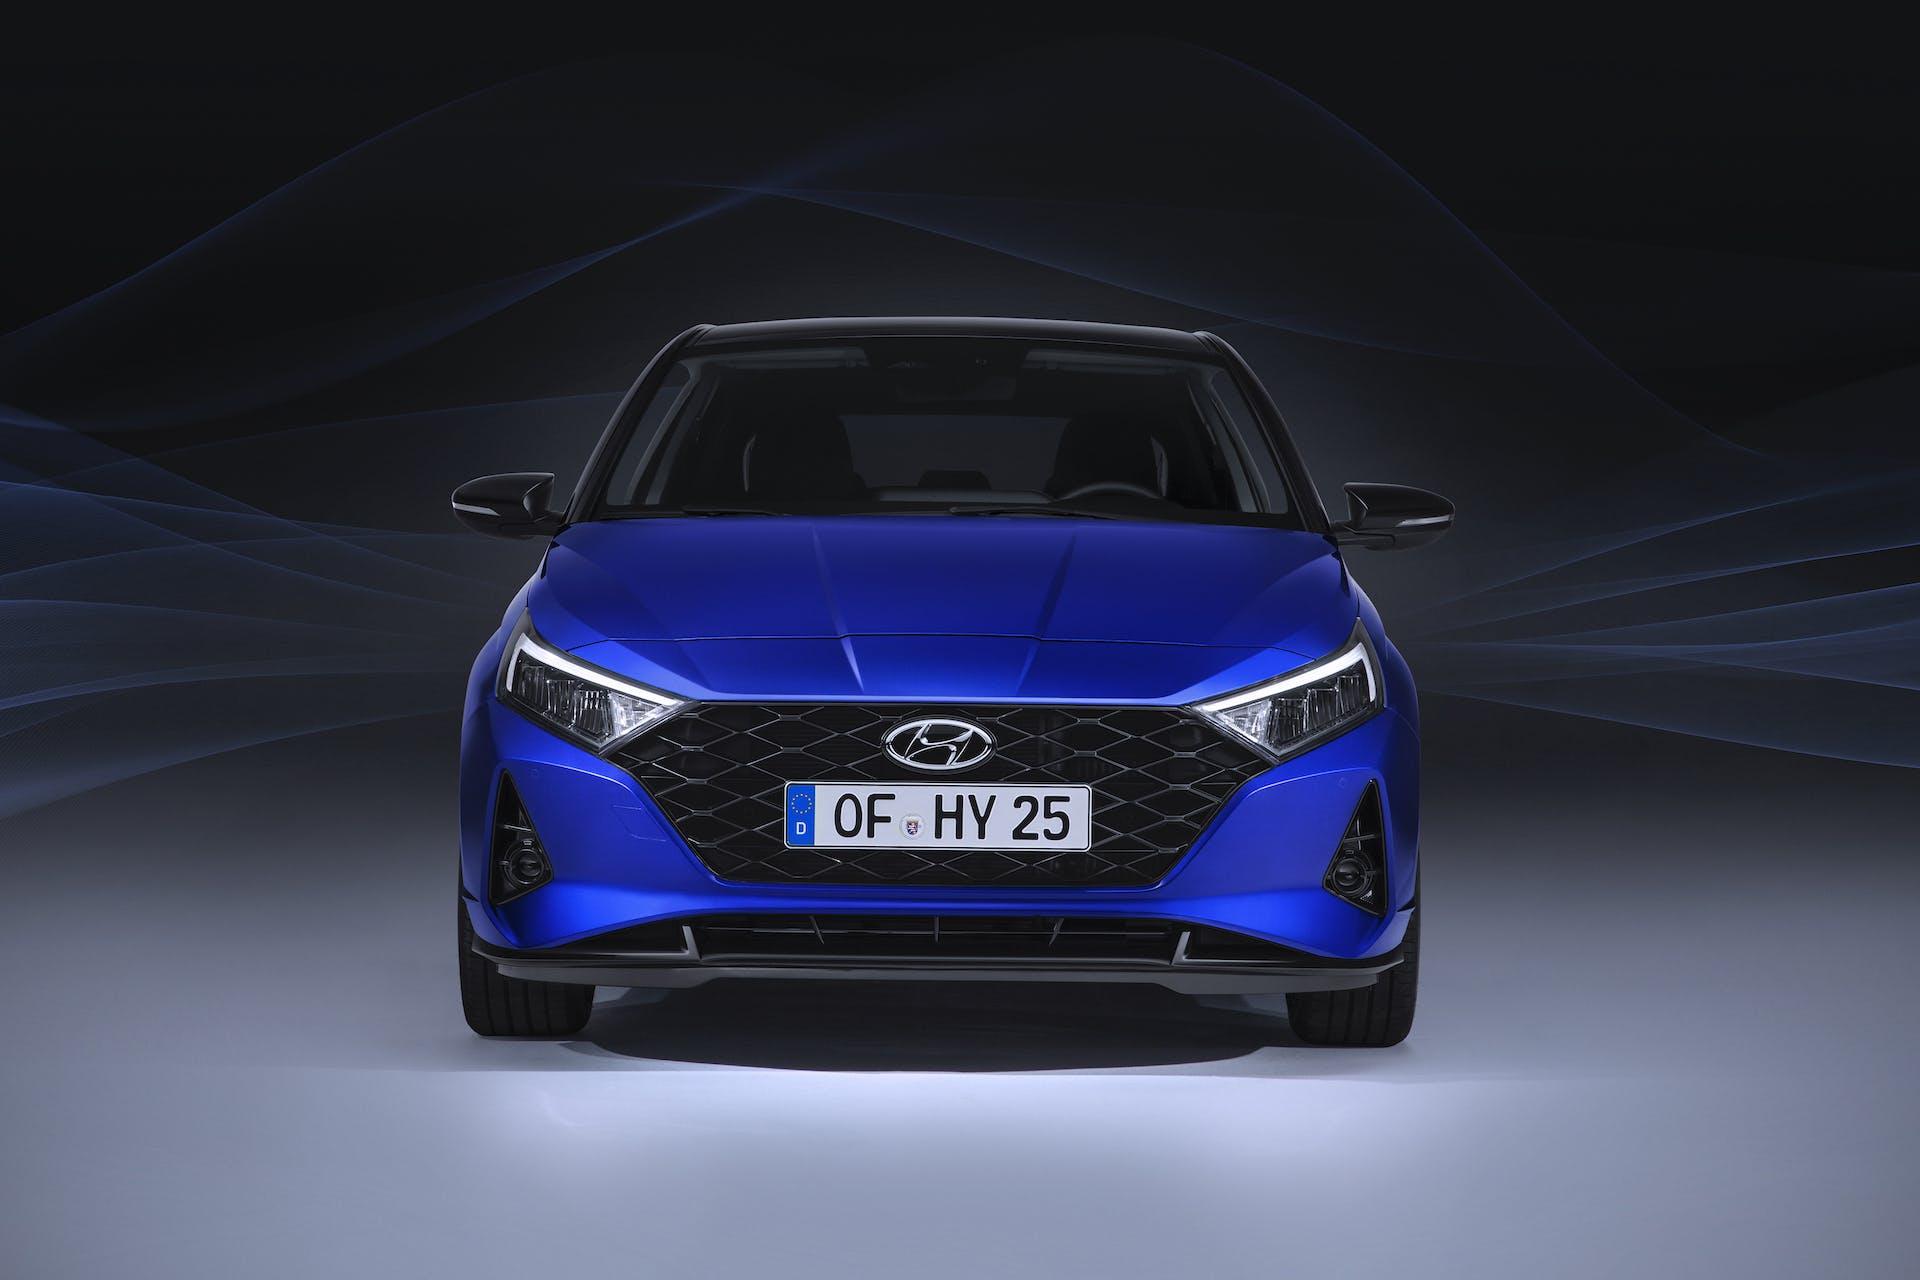 Nuova Hyundai i20 vista frontale